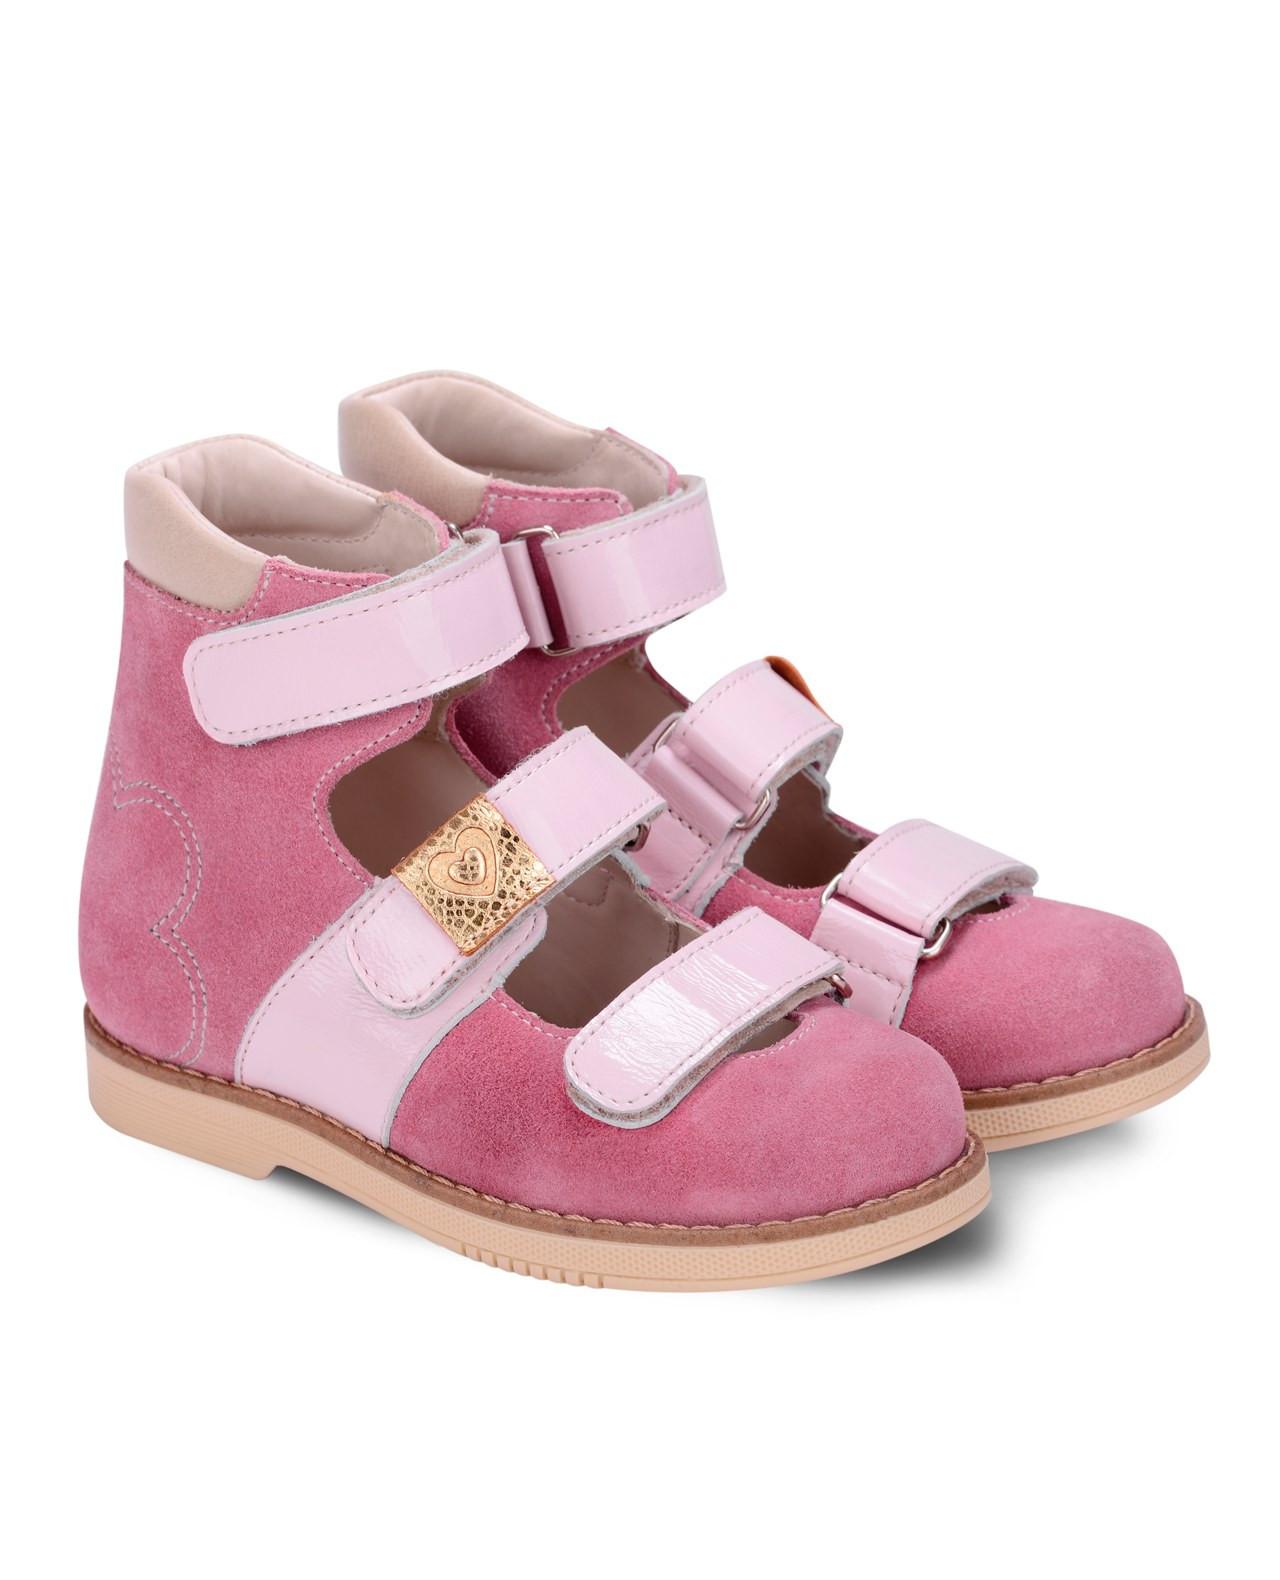 bb60ab582 Сандалии Детские, Tapiboo Кораллы розовый цвет, FT-25007.17-OL05O.01 ...